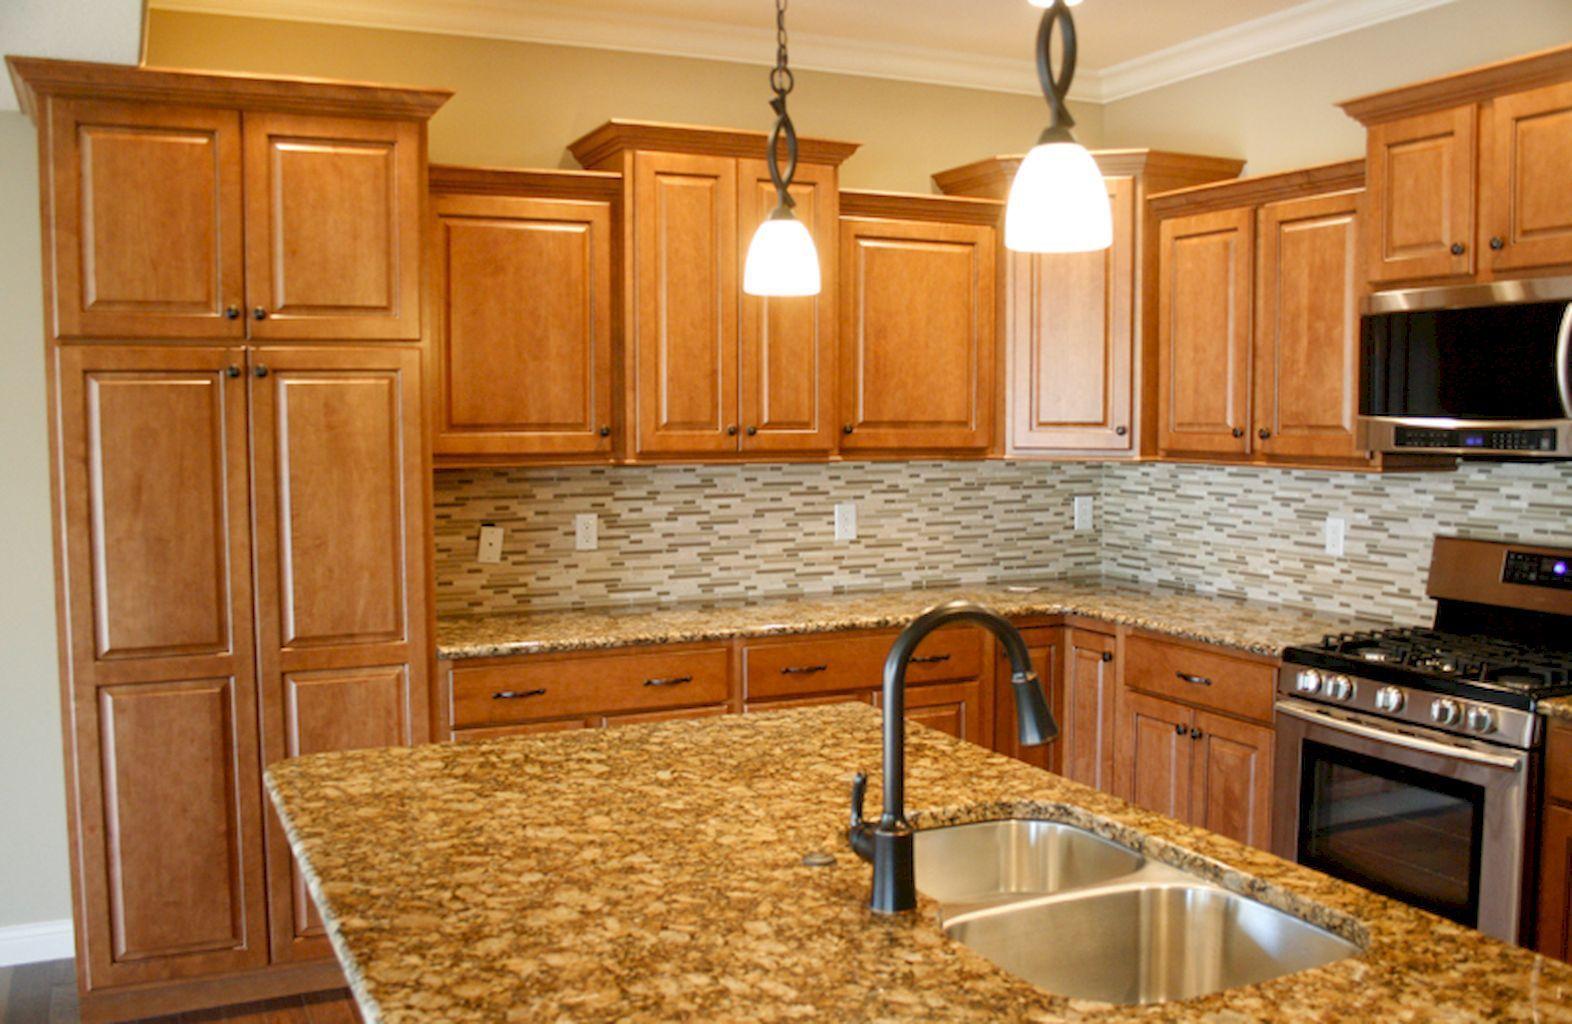 Farmhouse Kitchen Colors With Oak Cabinets